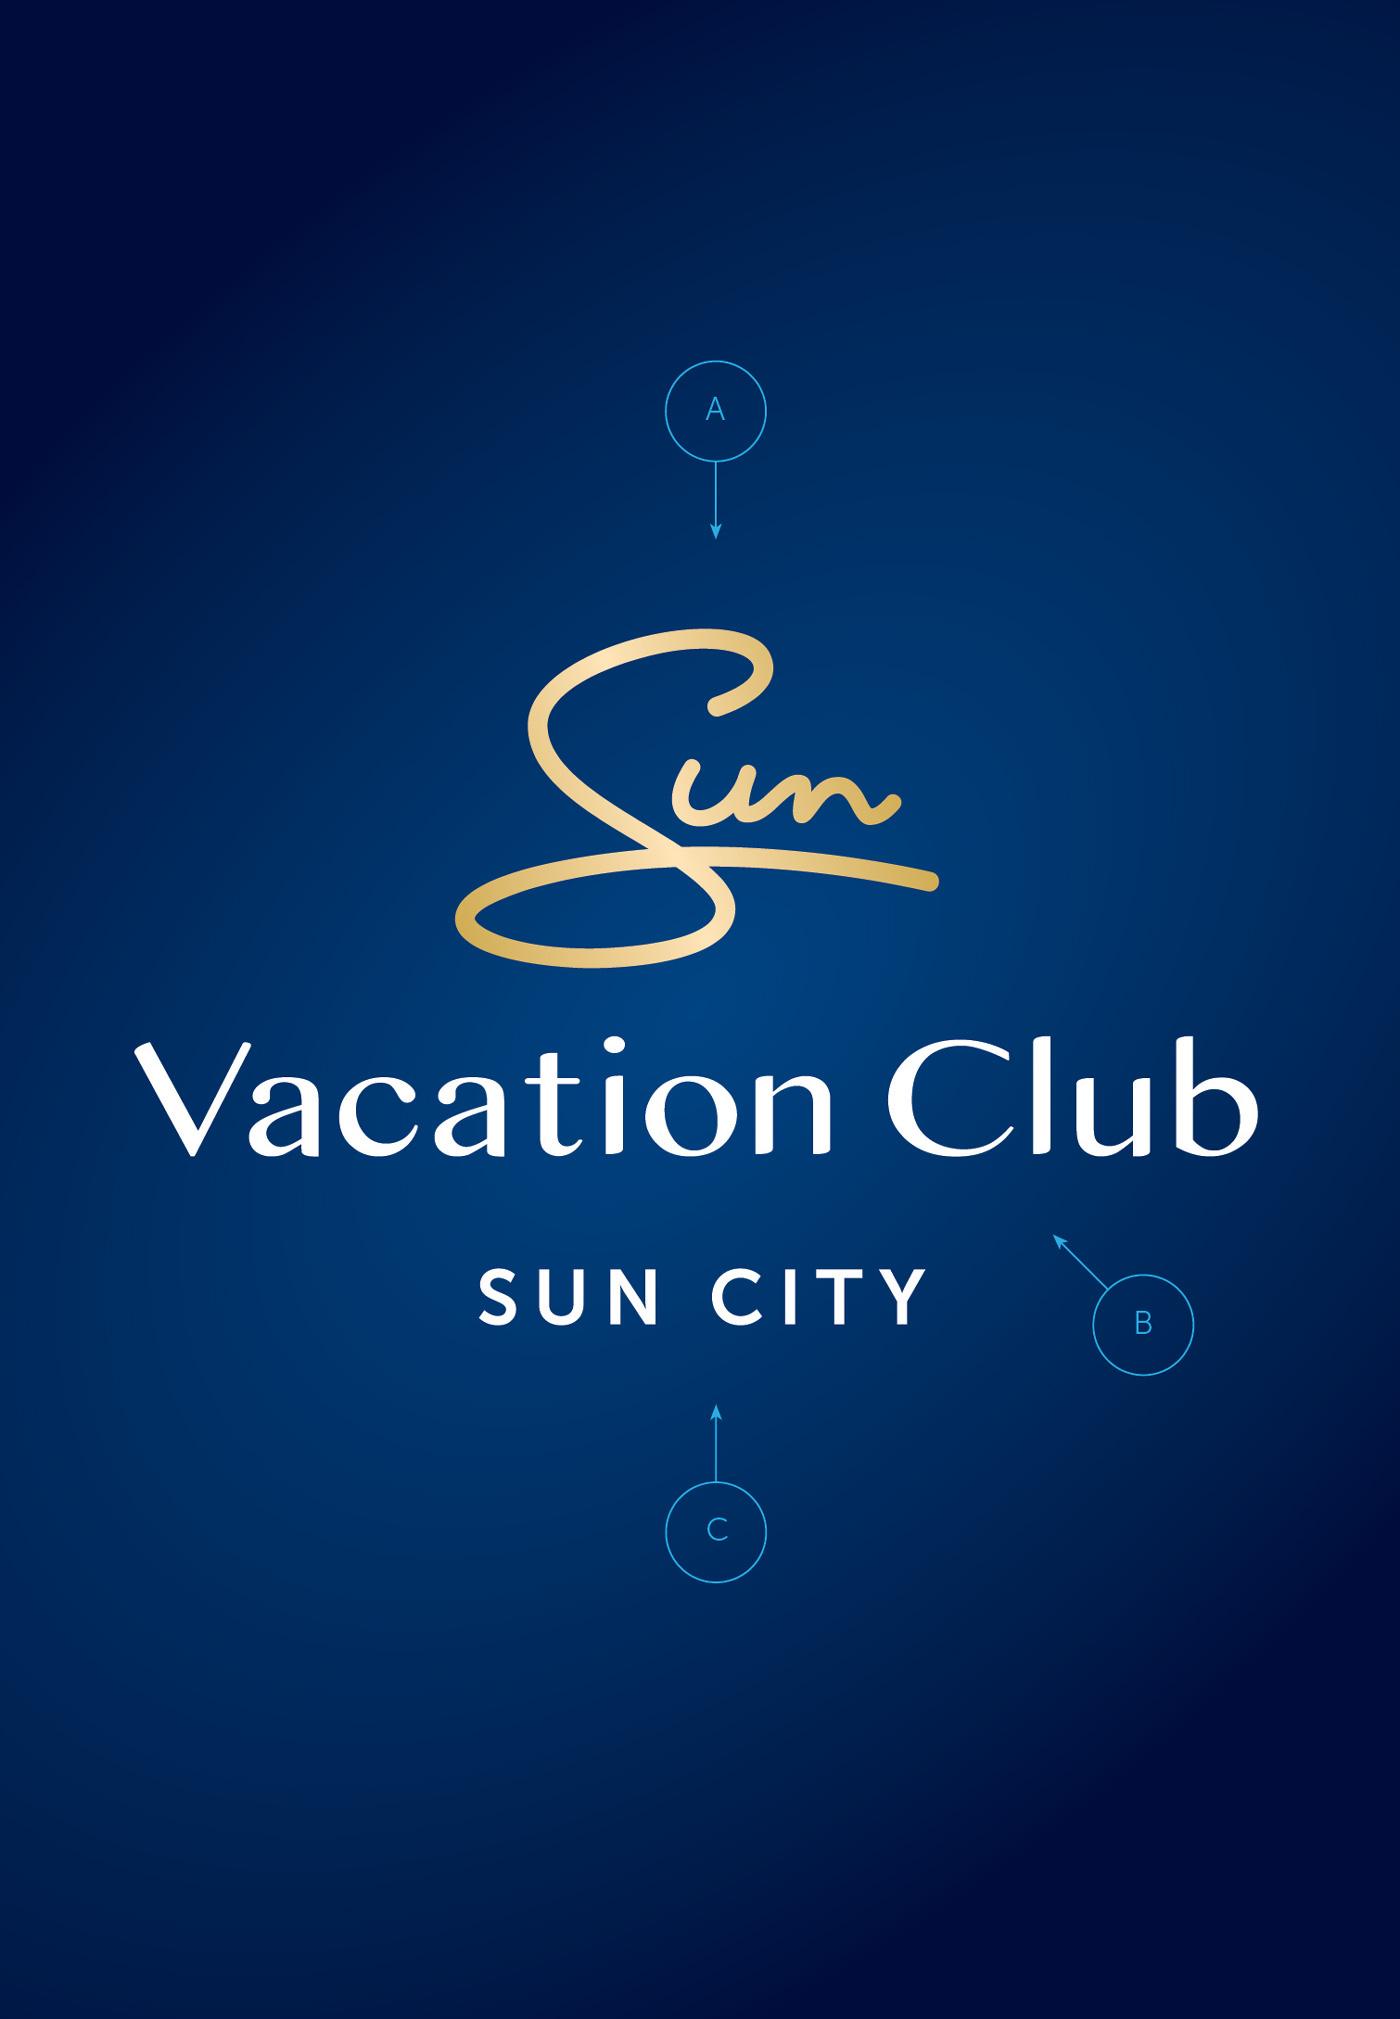 Sun City Vacation Club On Behance